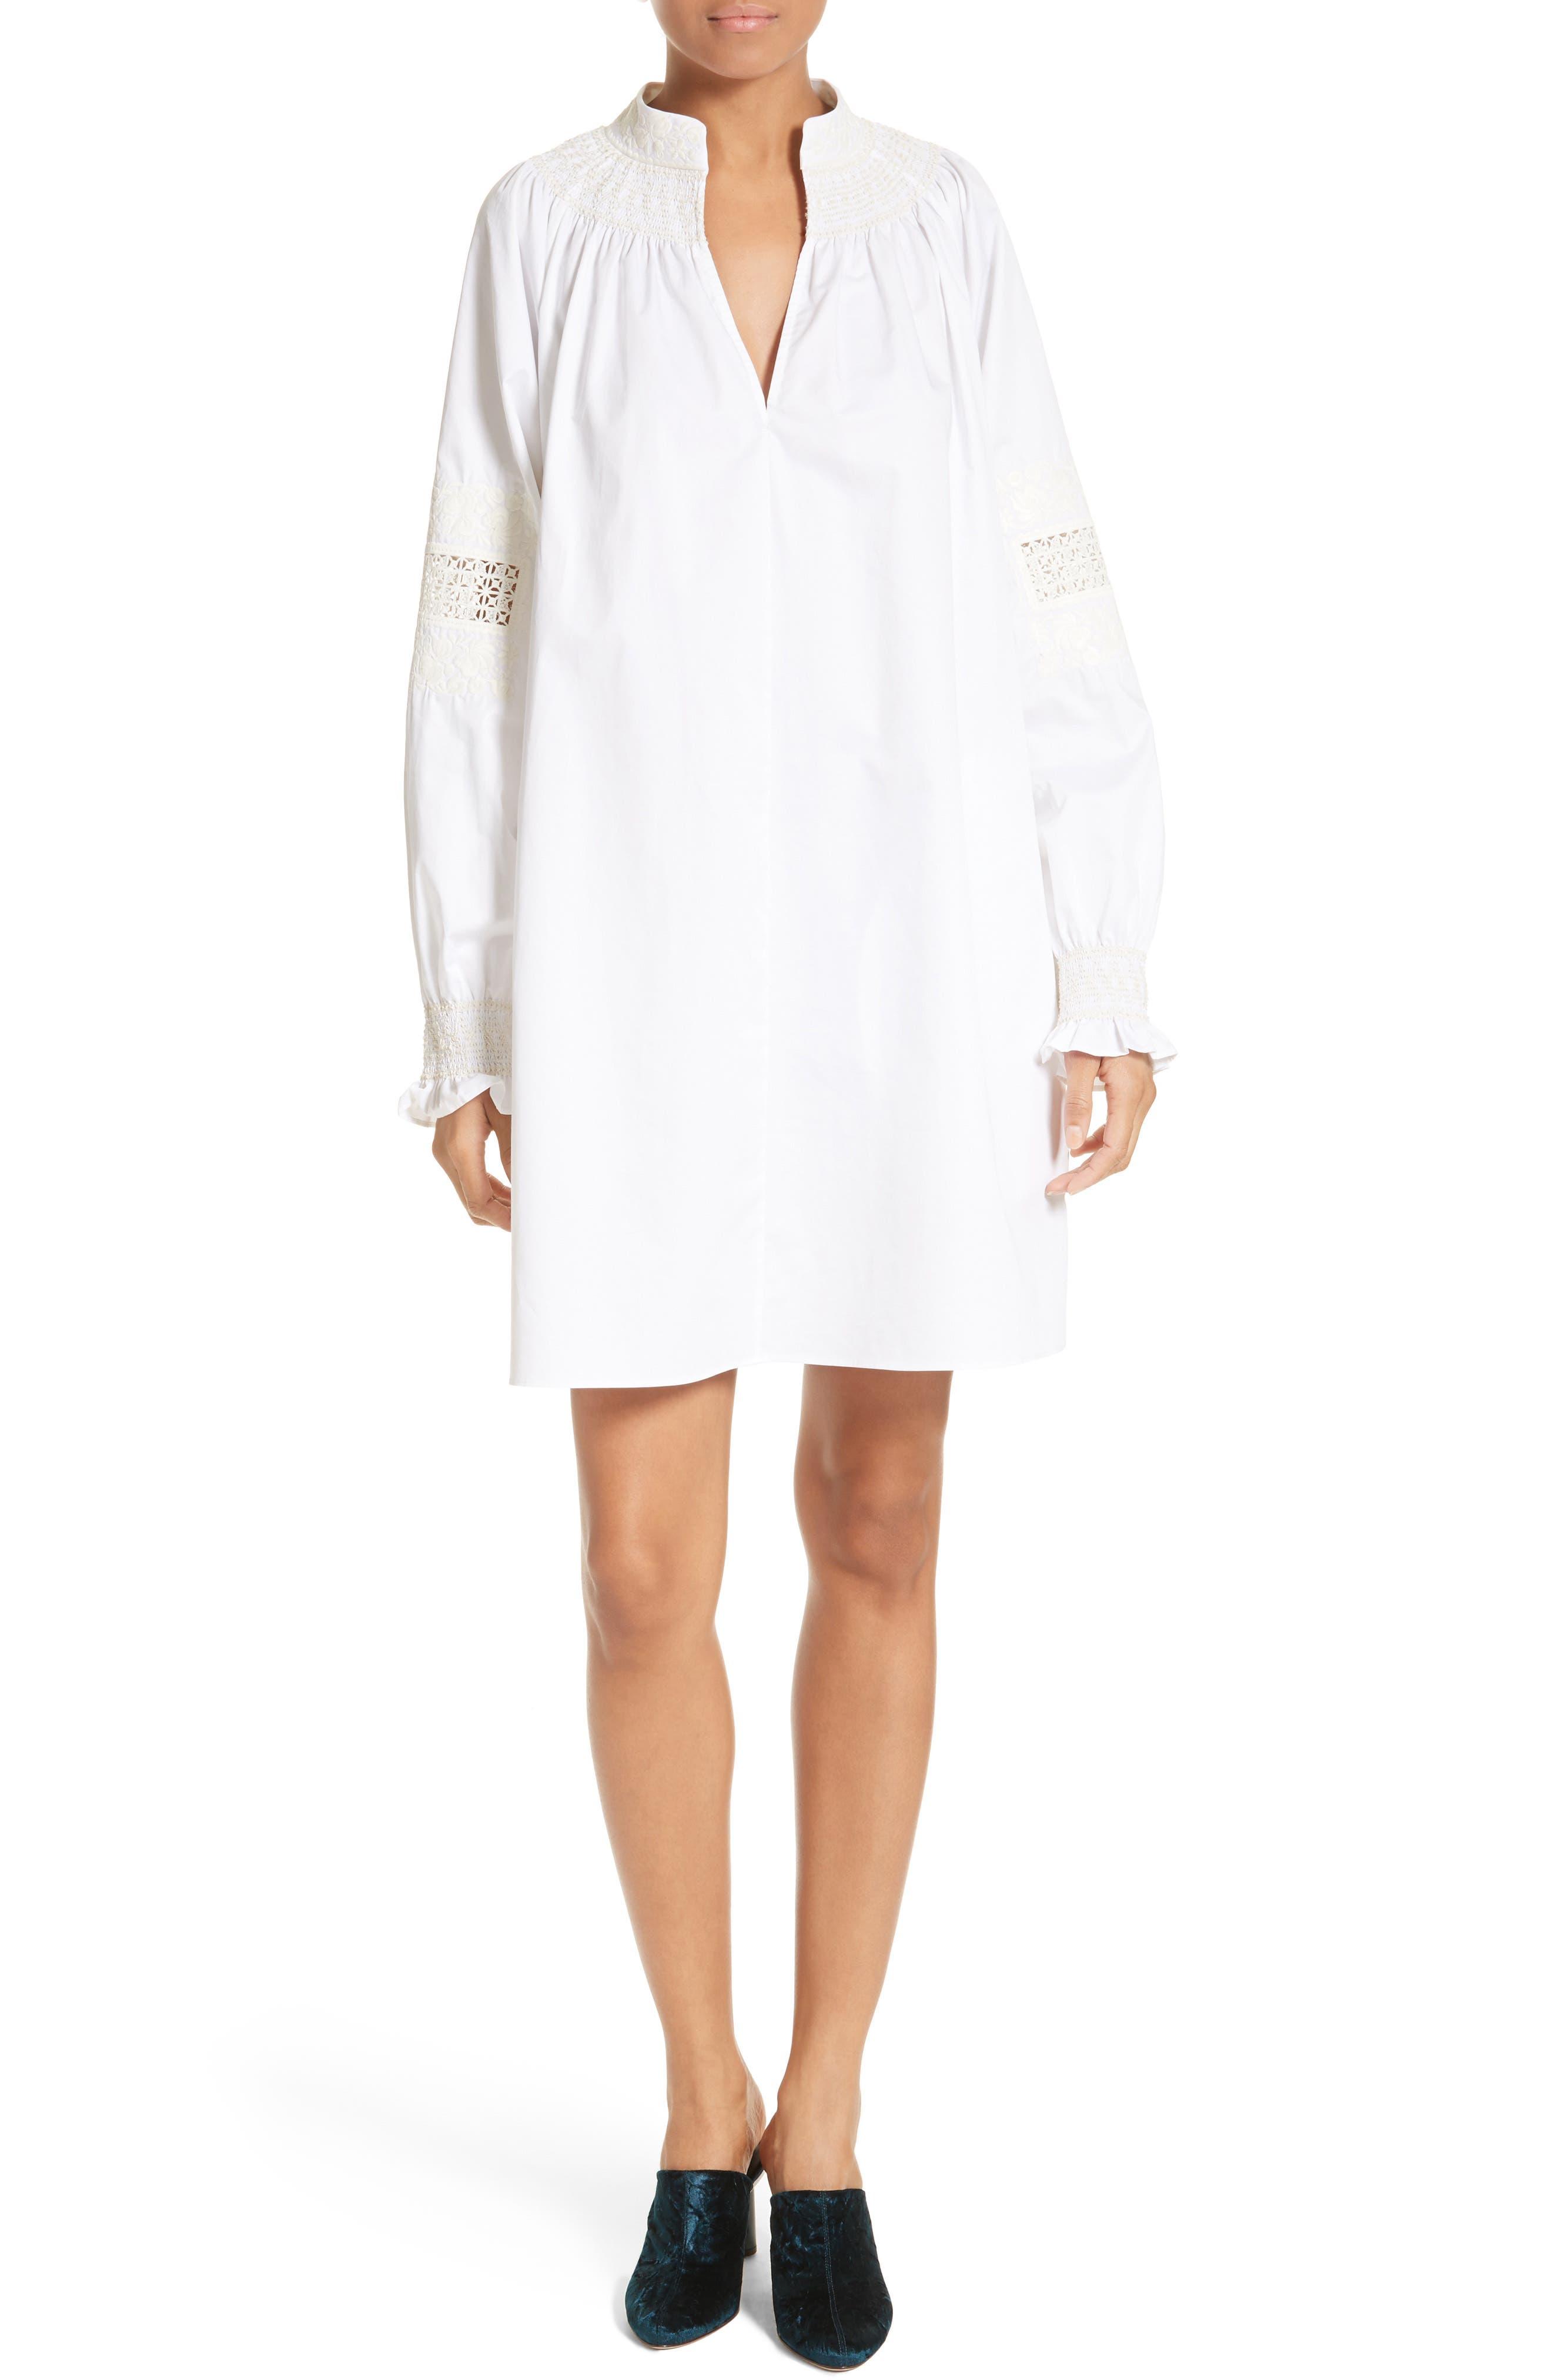 Smocked Tunic Dress,                         Main,                         color, White/ Ivory Multi